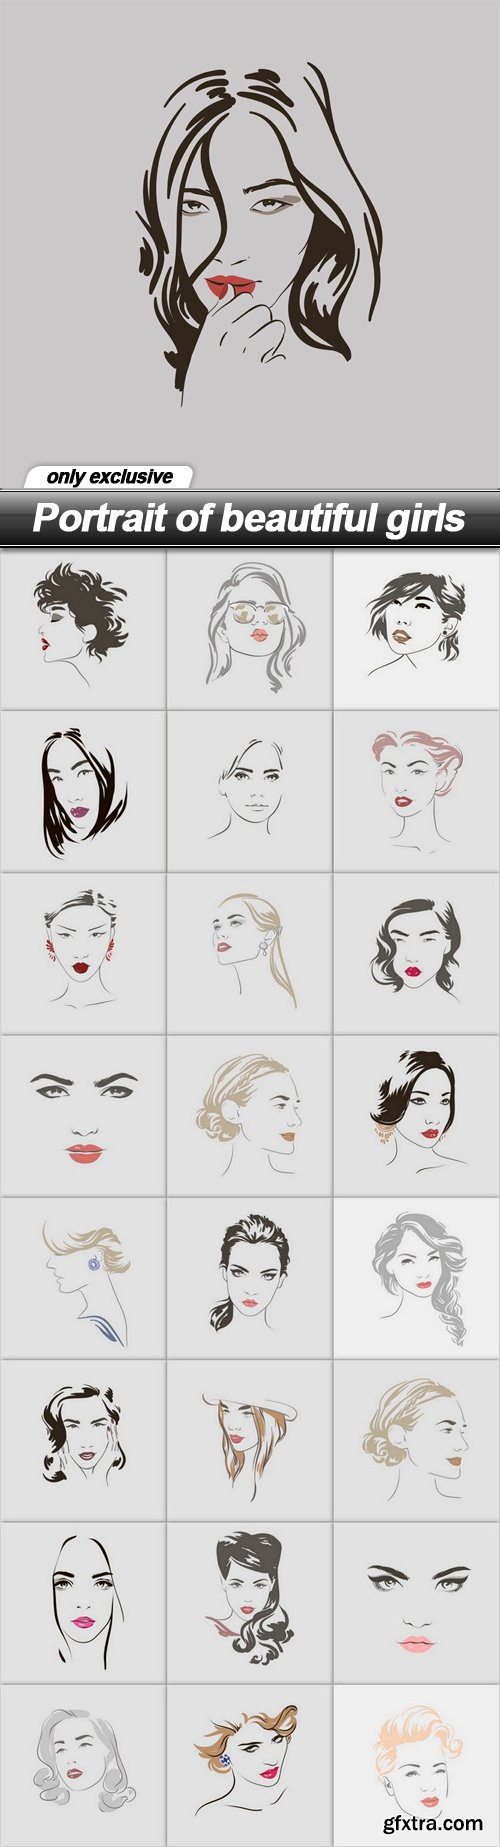 Portrait of beautiful girls - 25 EPS